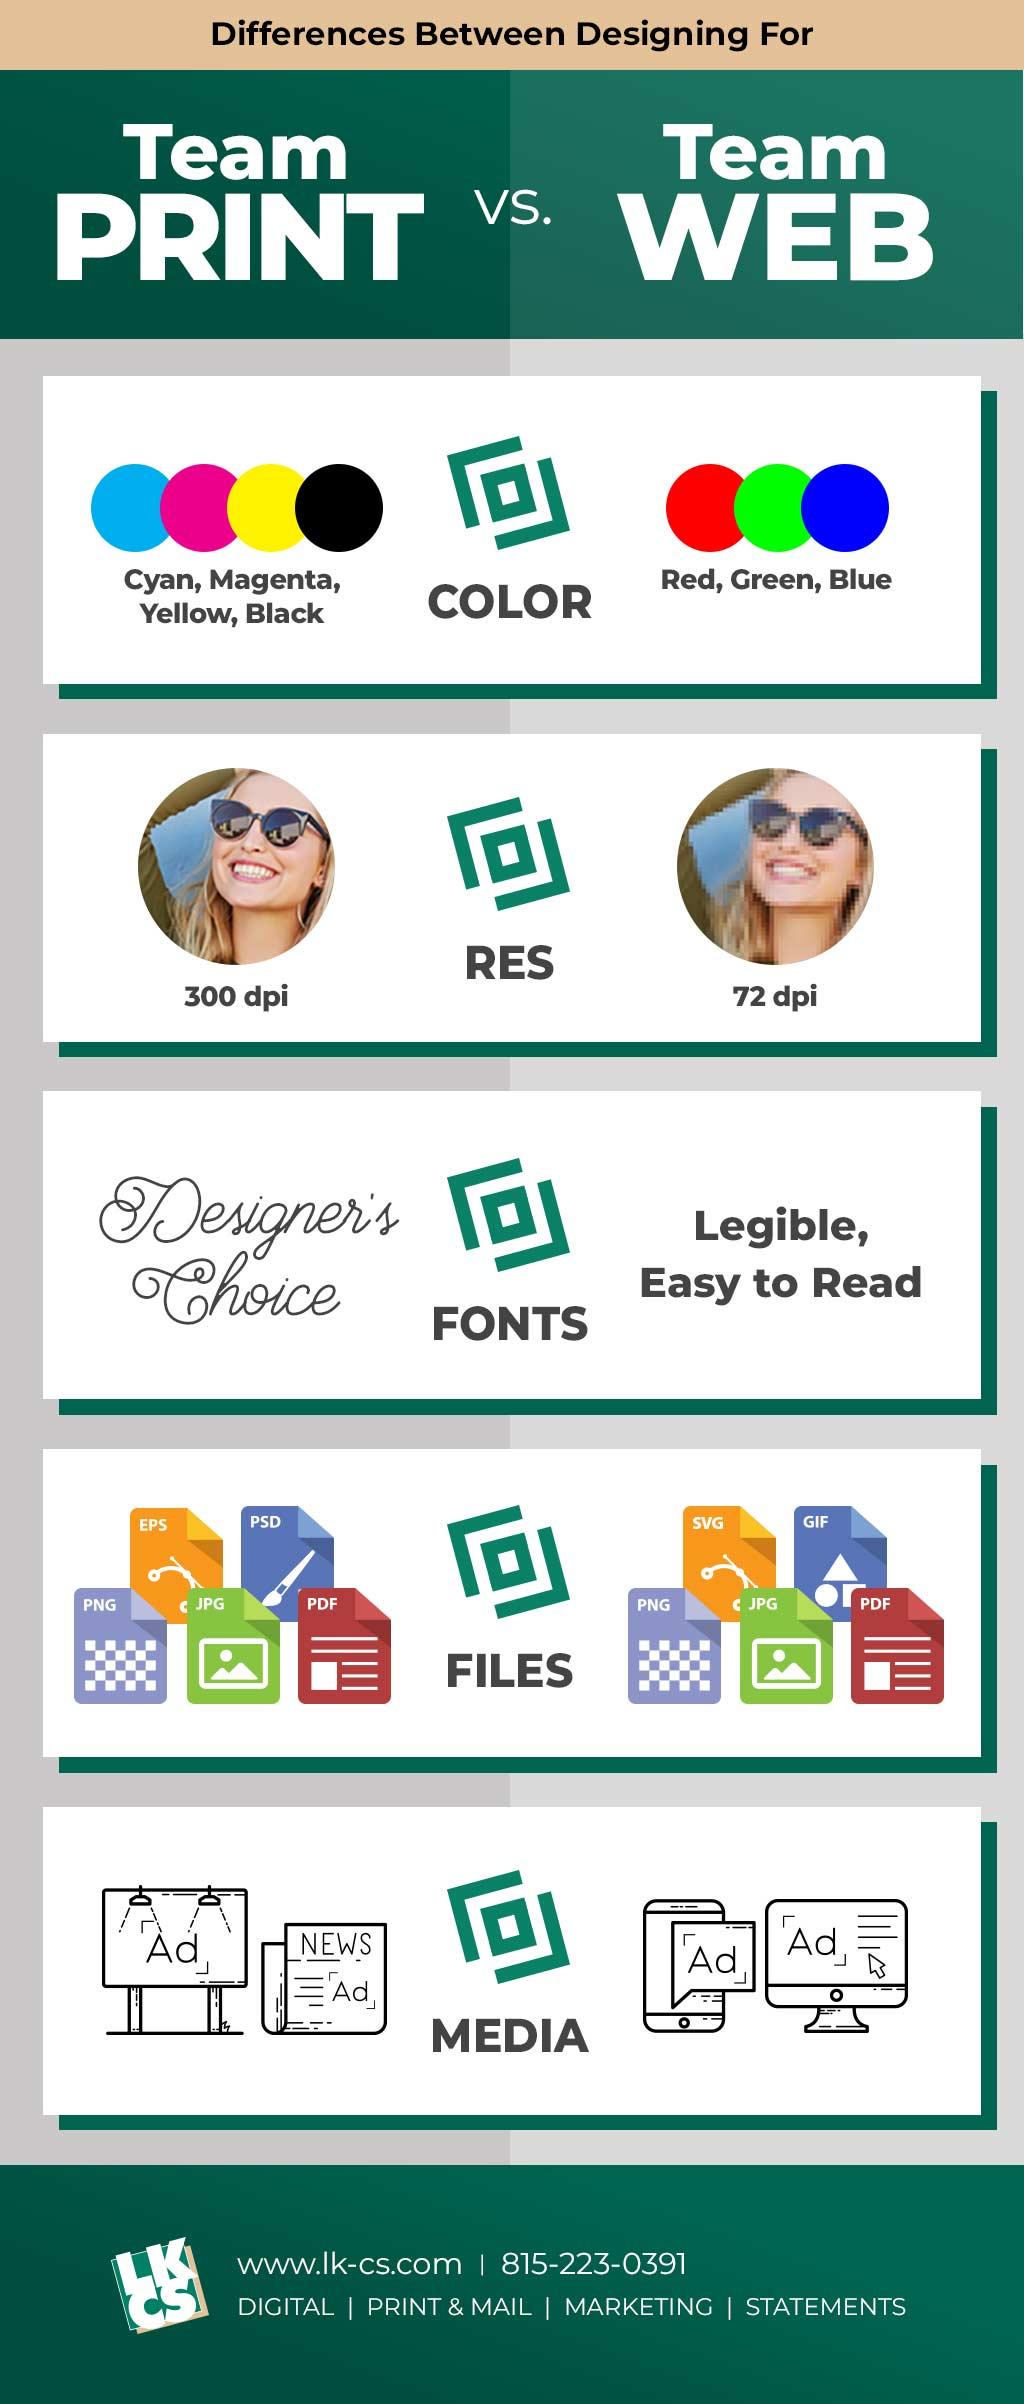 Team Print vs. Team Web Infographic